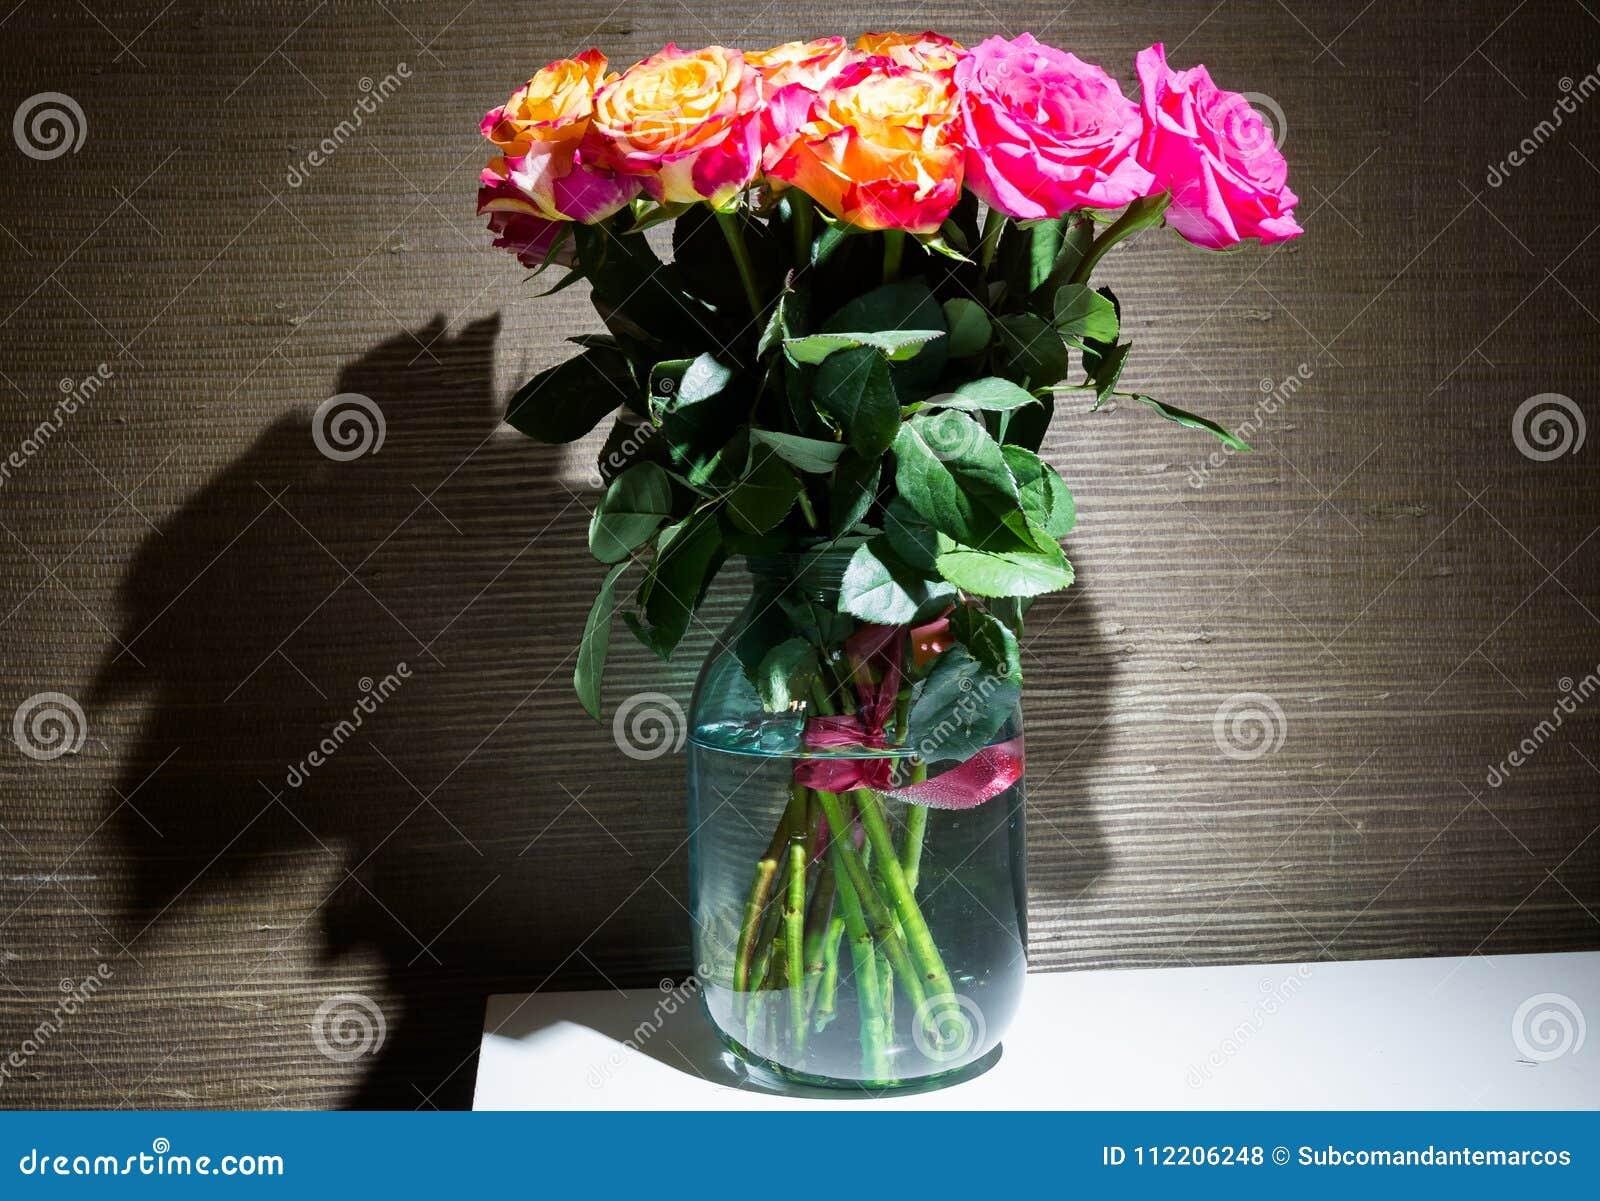 the glass roses symbols